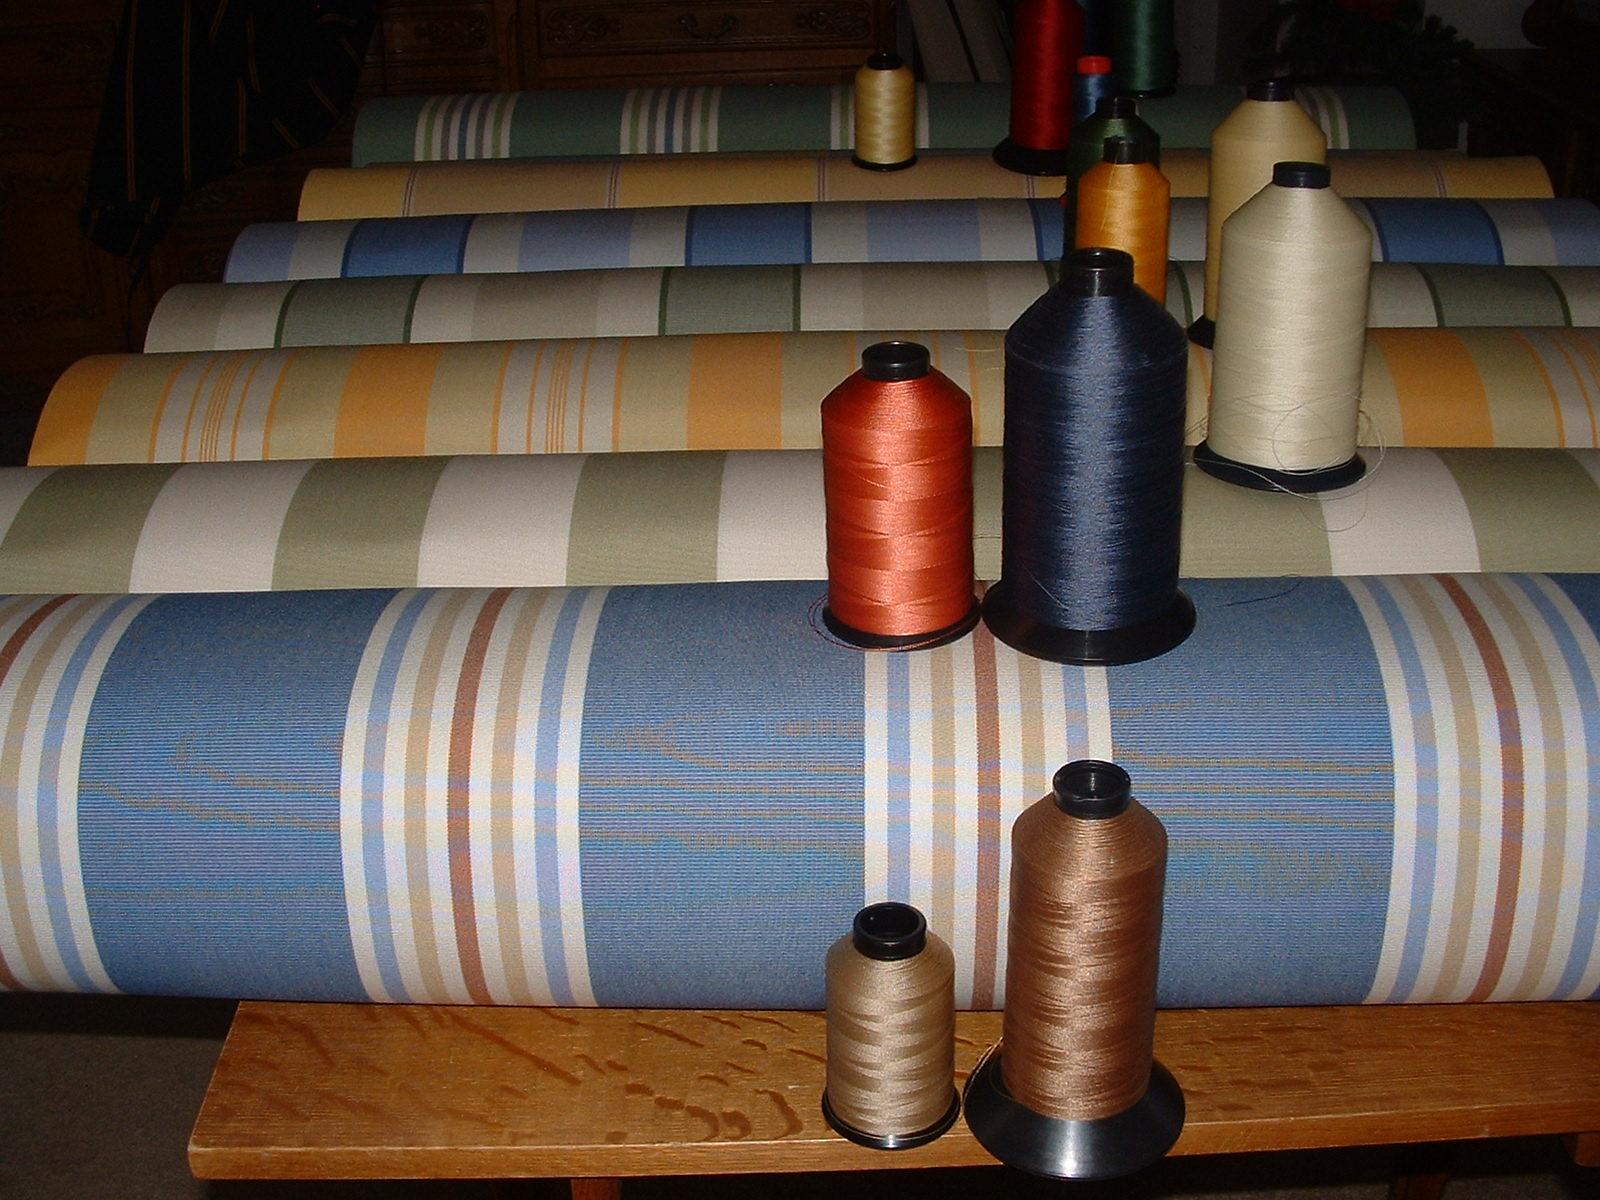 Vintage Awnings: Spring 2012 Vintage Trailer Awning Fabric ...